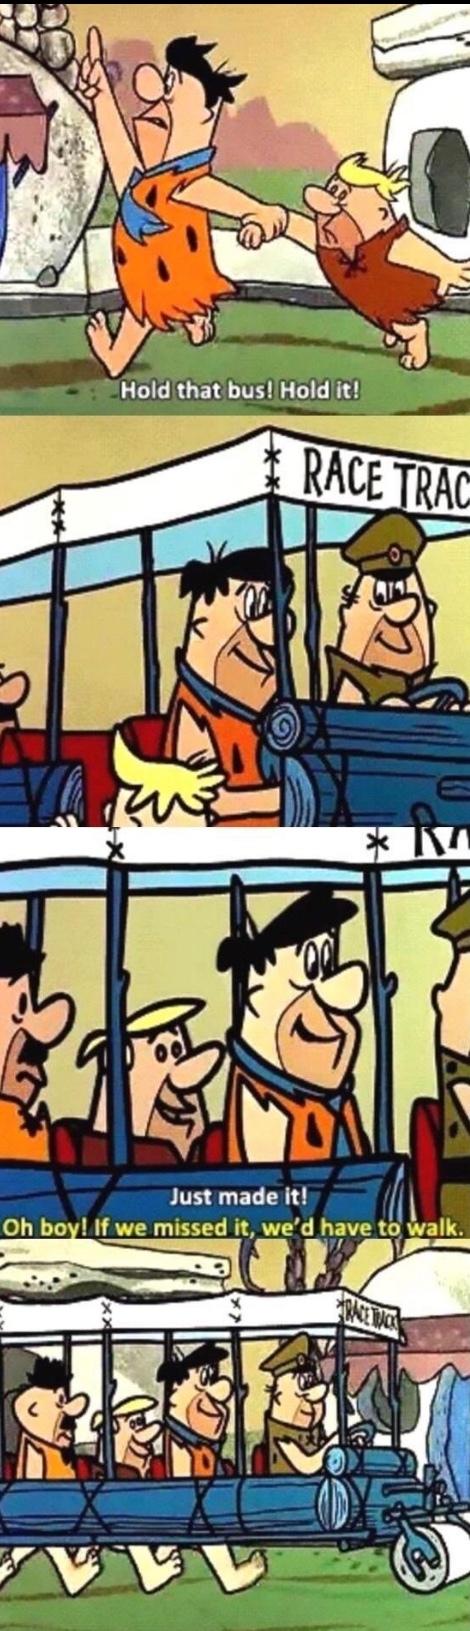 the good old times man - meme